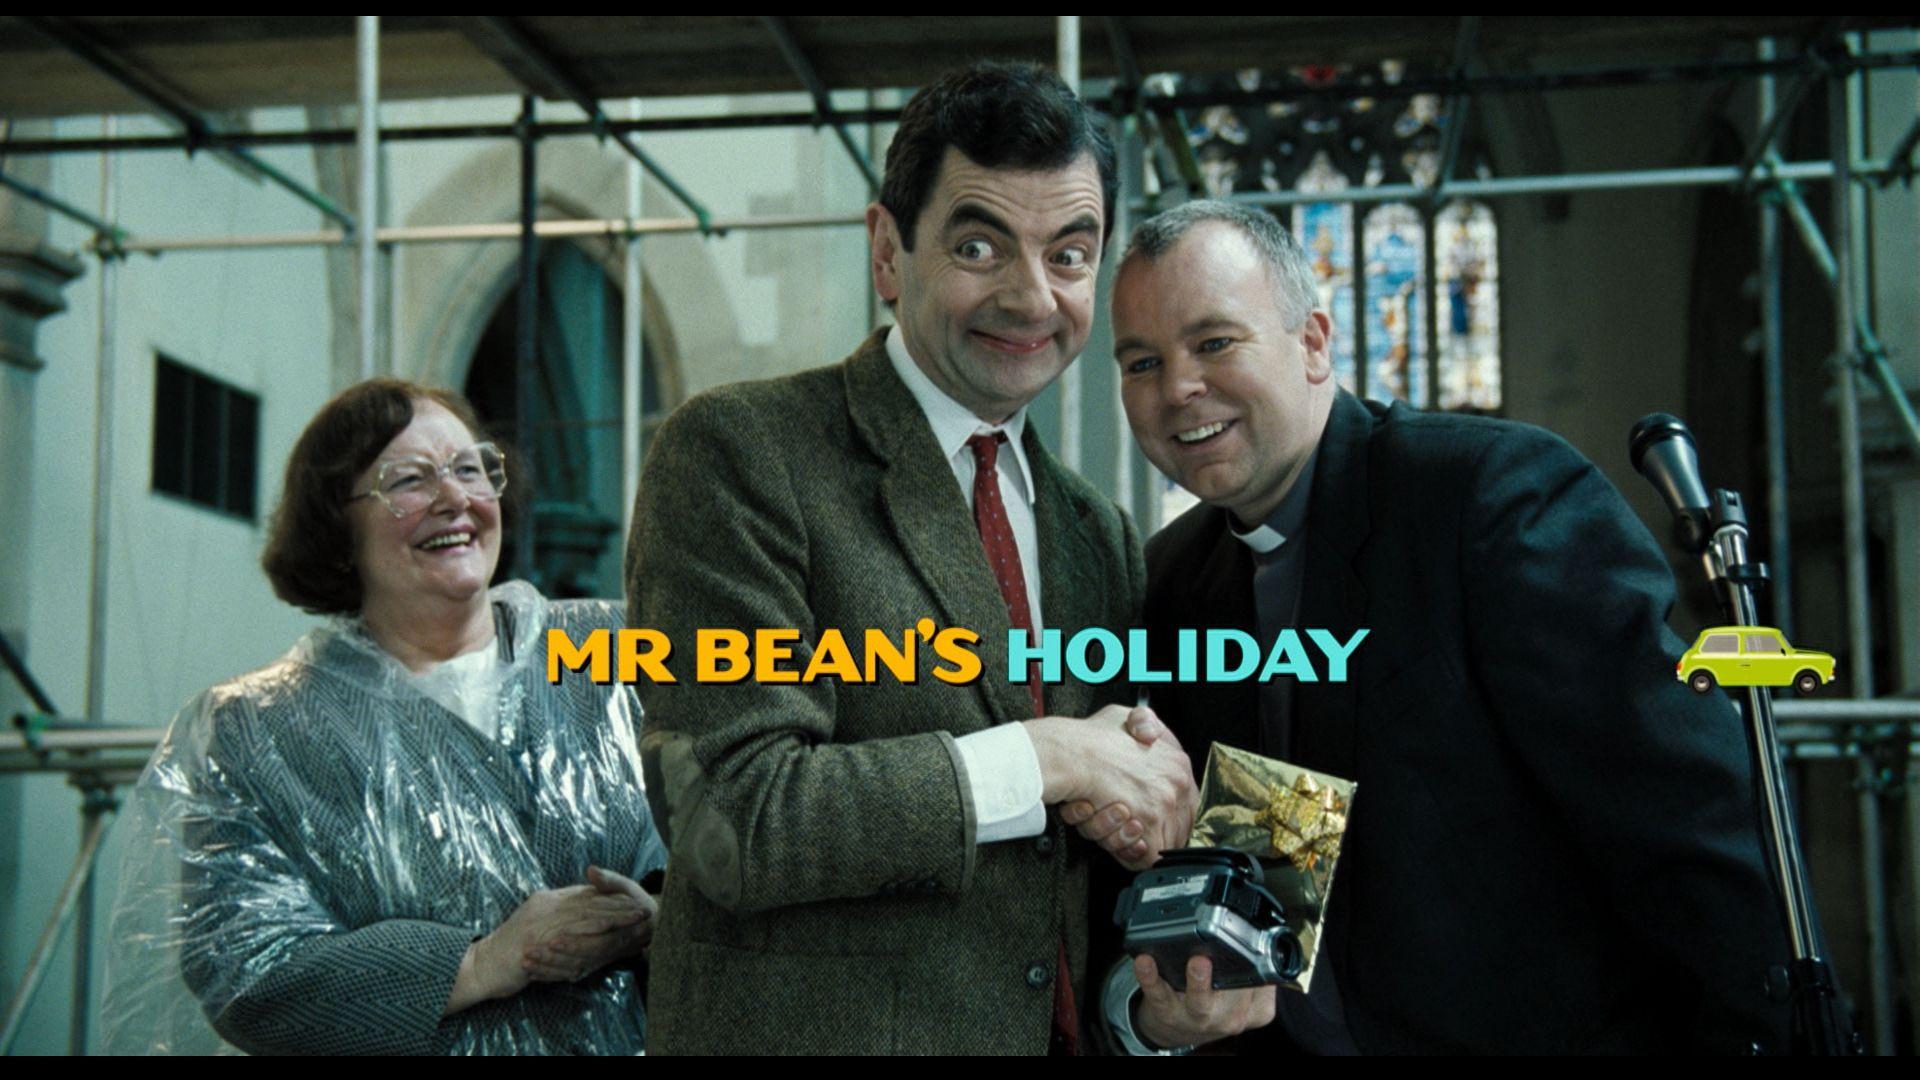 Мистер Бин на отдыхе / Mr. Bean's Holiday (2007) Blu-Ray CEE 1080p